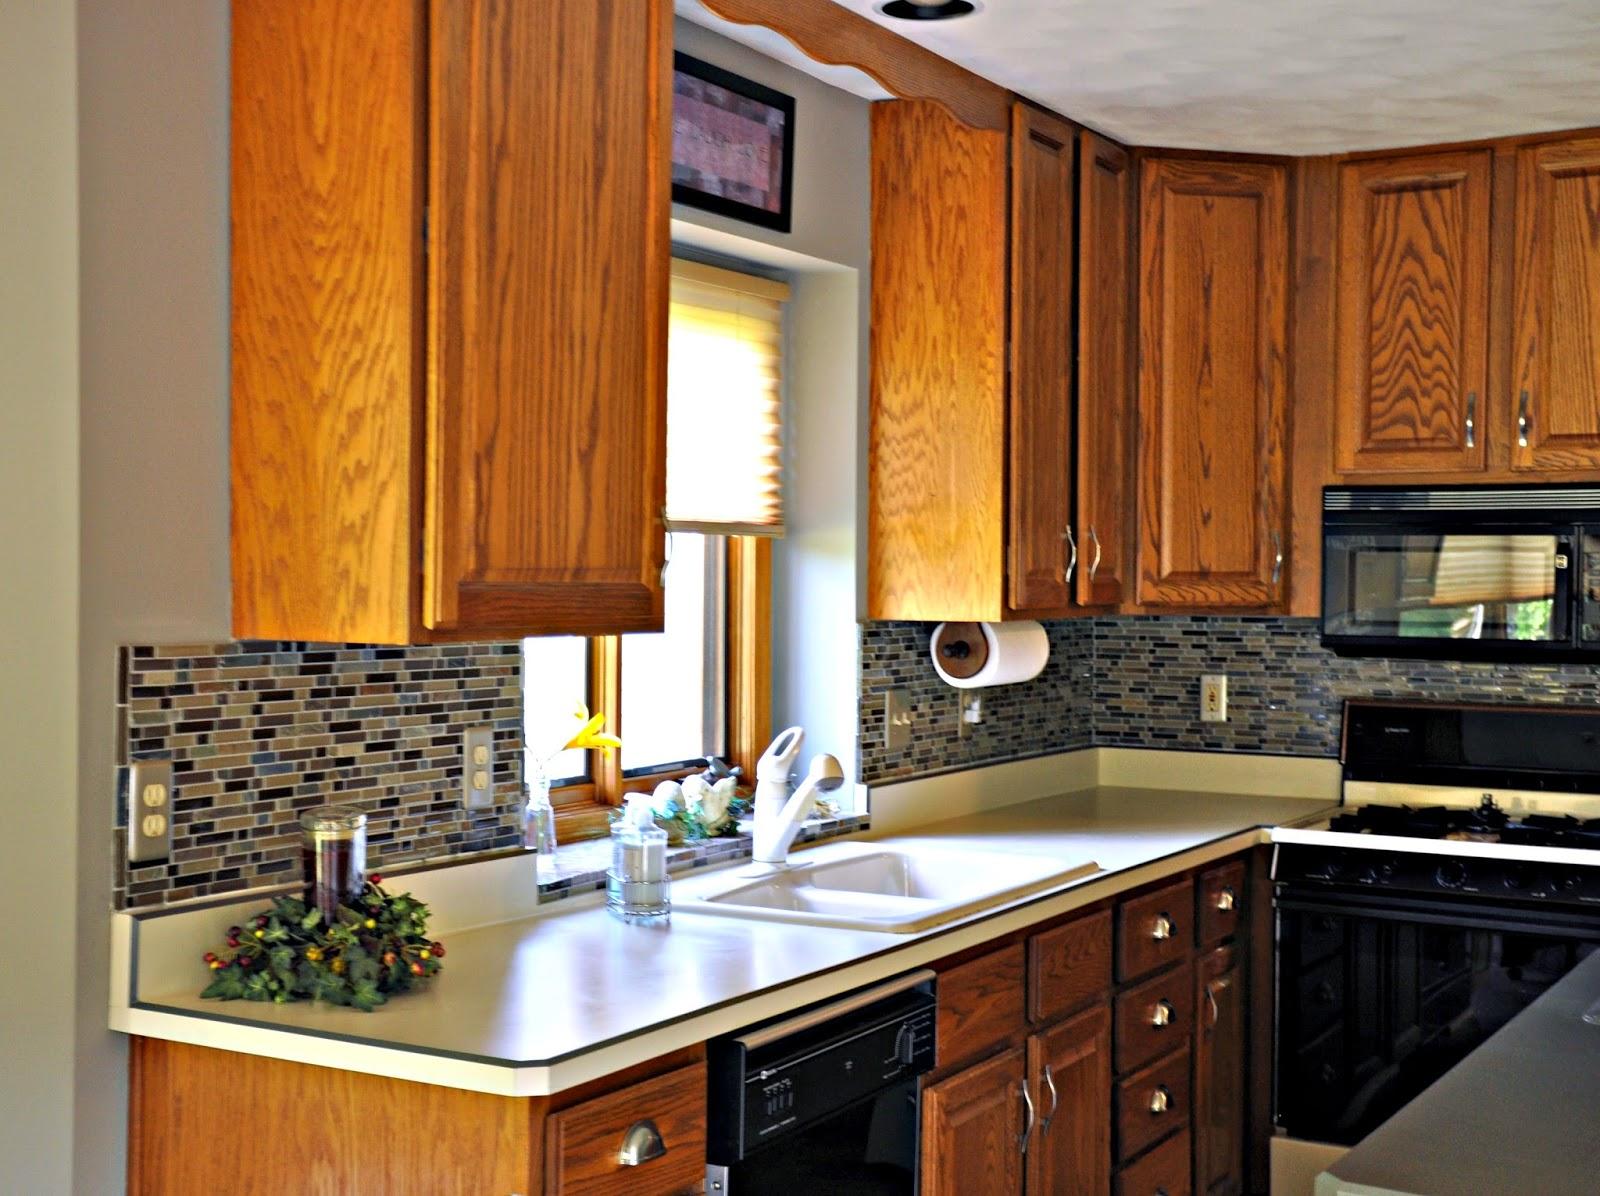 diy updates glass mosaic tile kitchen mosaic tile kitchen backsplash DIY Updates Glass Mosaic Tile Kitchen Backsplash and Marble Tile Fireplace Surround